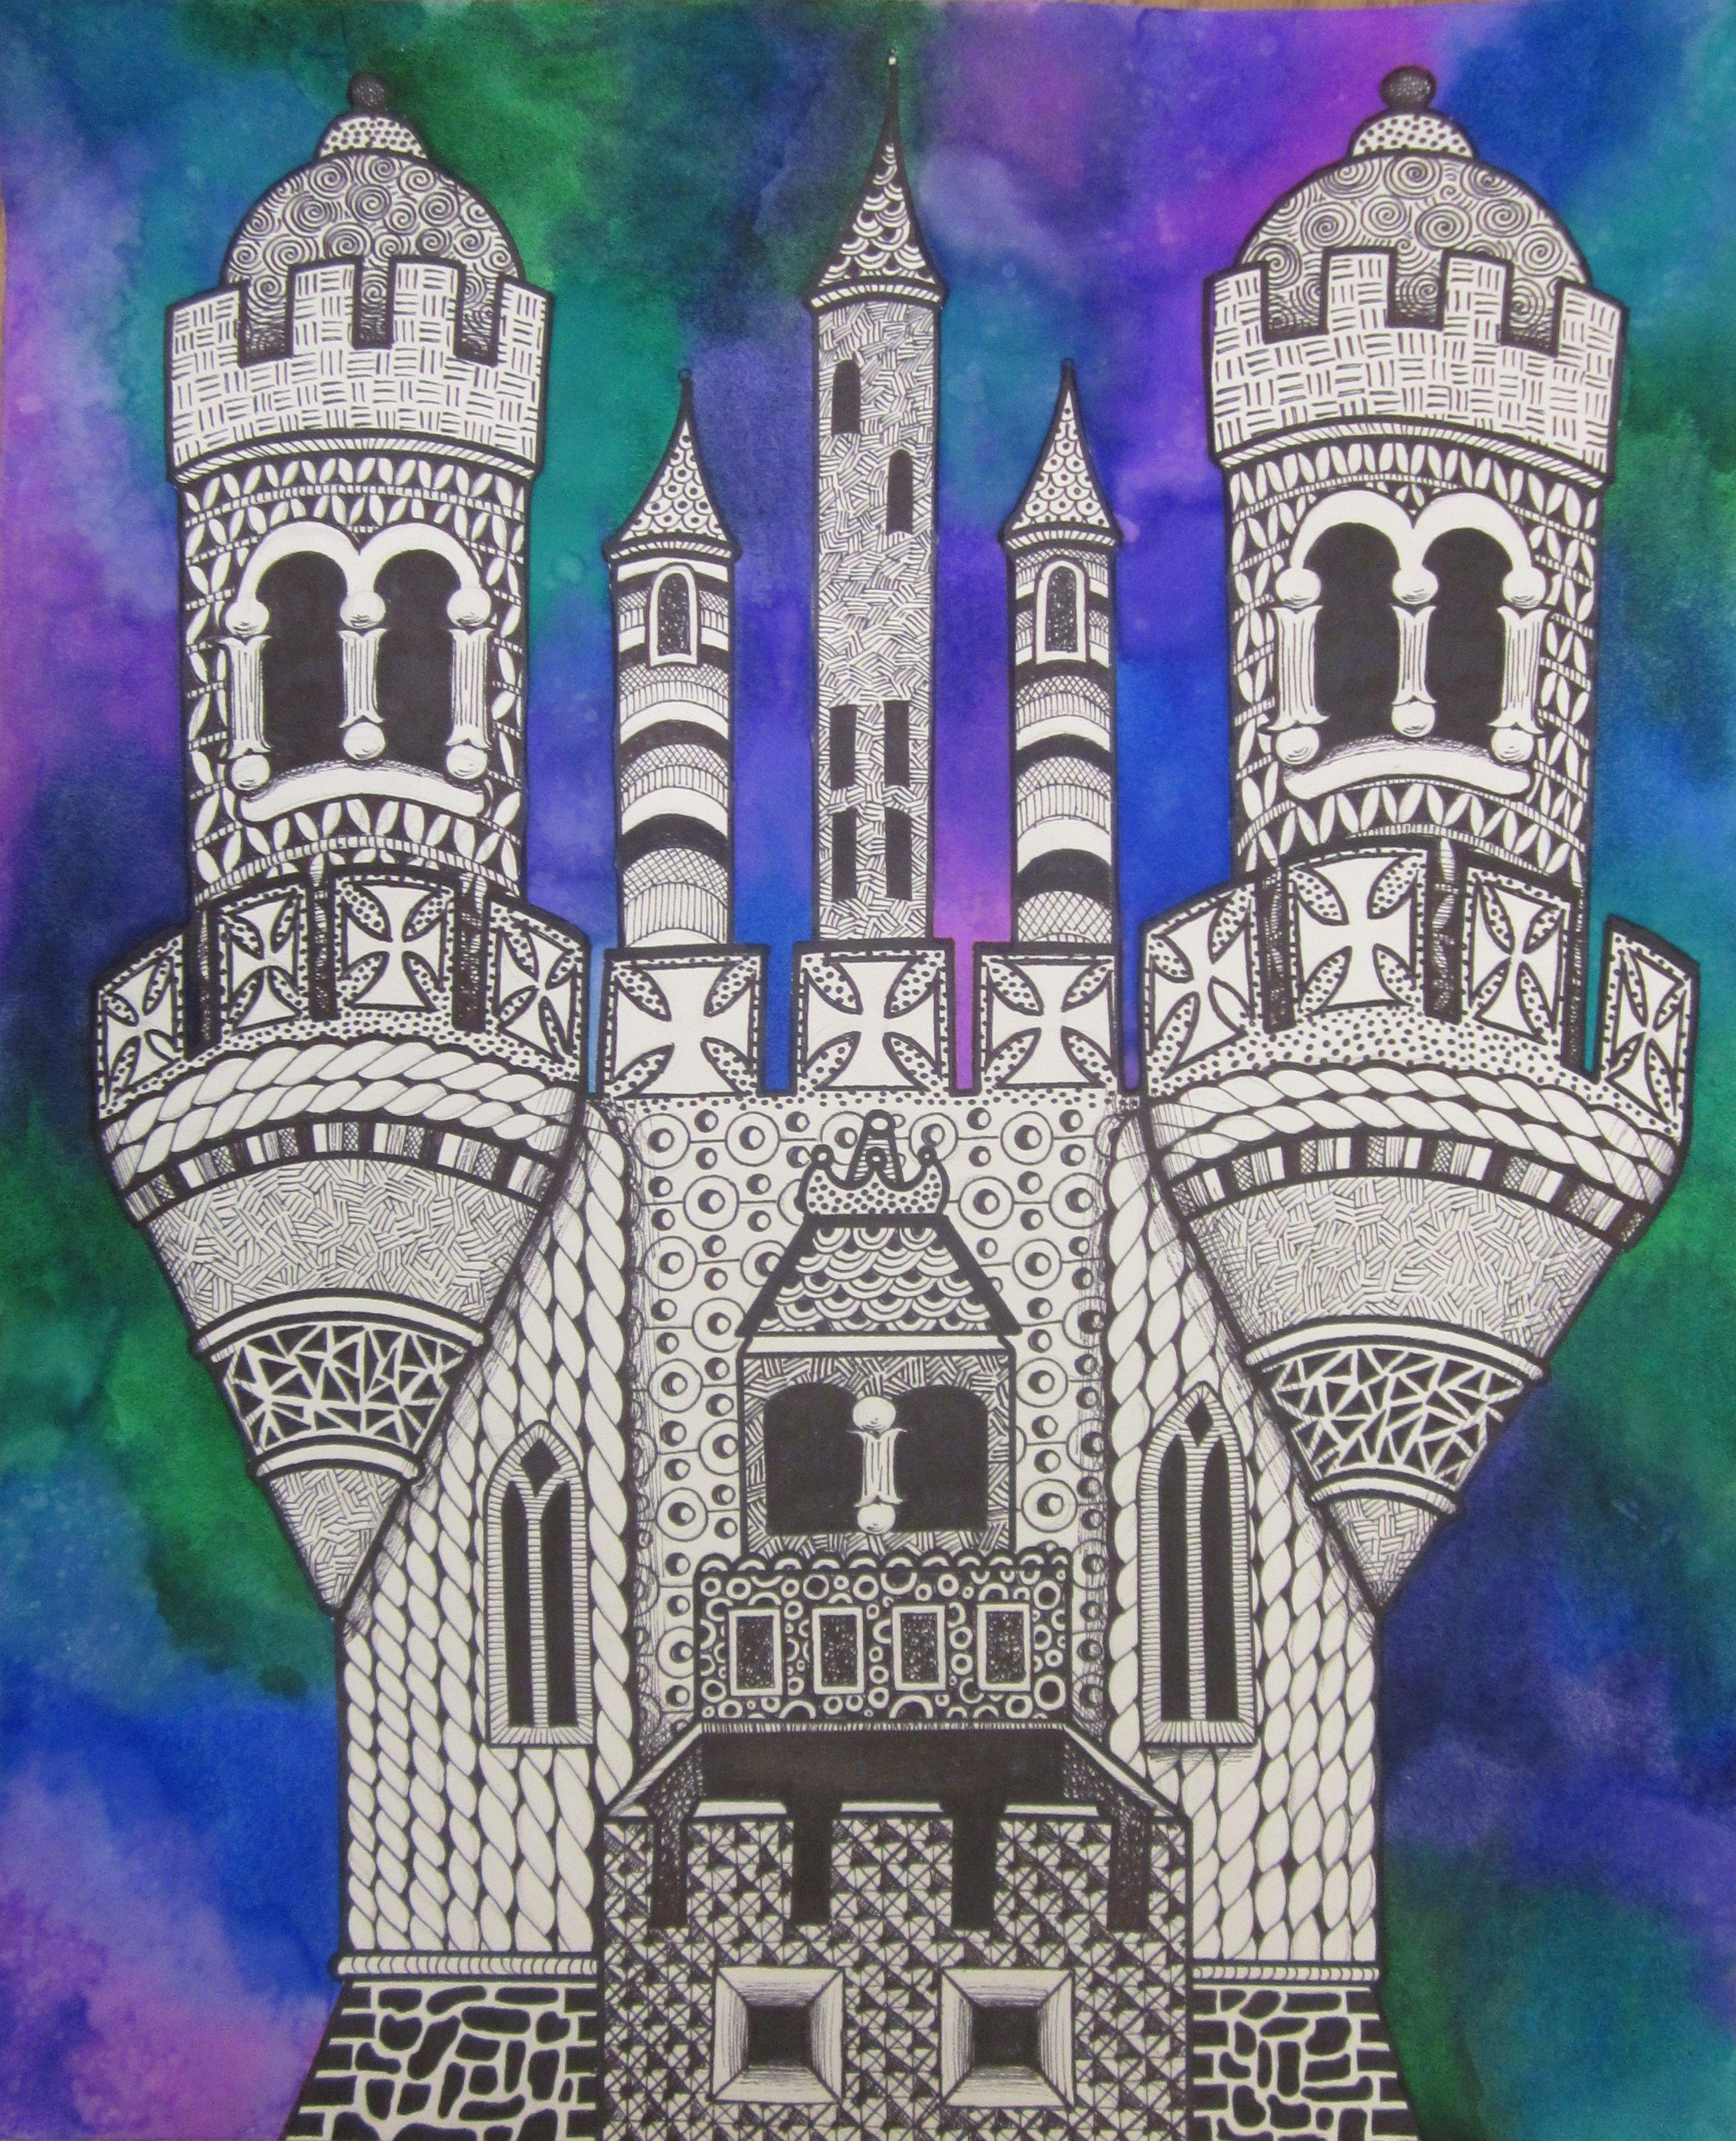 Pin By Aafke Huurman On Art Lesson Ideas Castles Art Lessons Middle School Homeschool Art Art Lessons